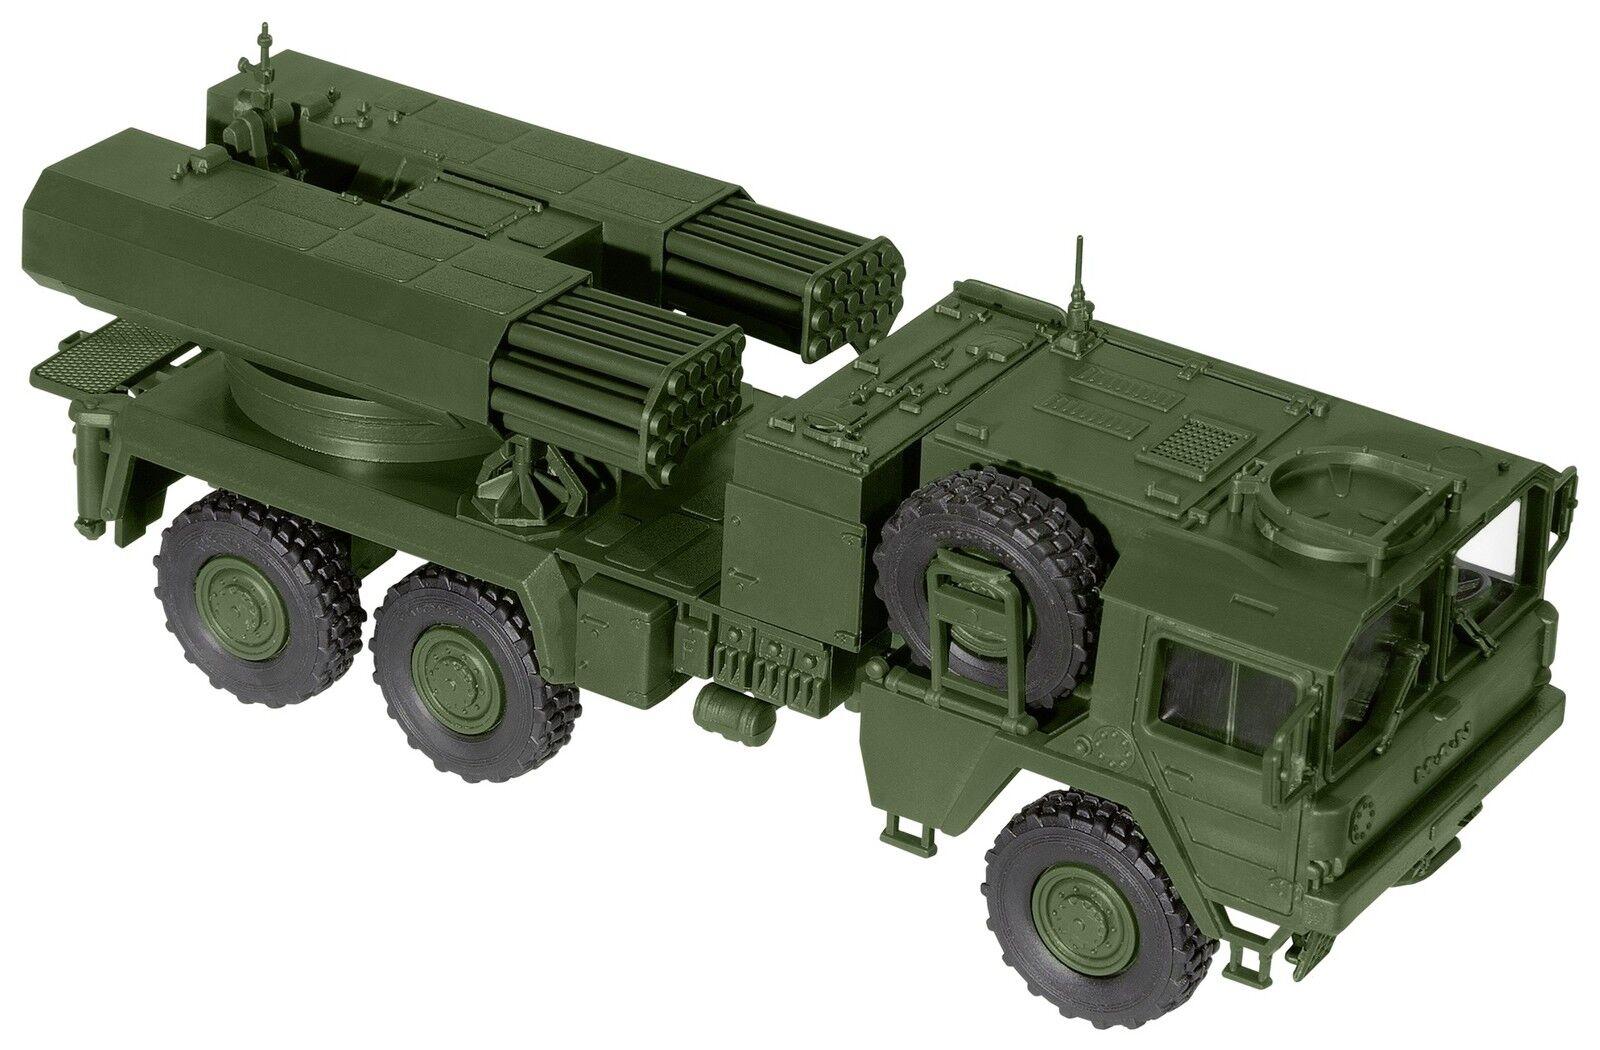 Roco H0 05057 Minitank Bausatz  MAN LKW Raketen System LARS 2  BW 1 87 NEU + OVP